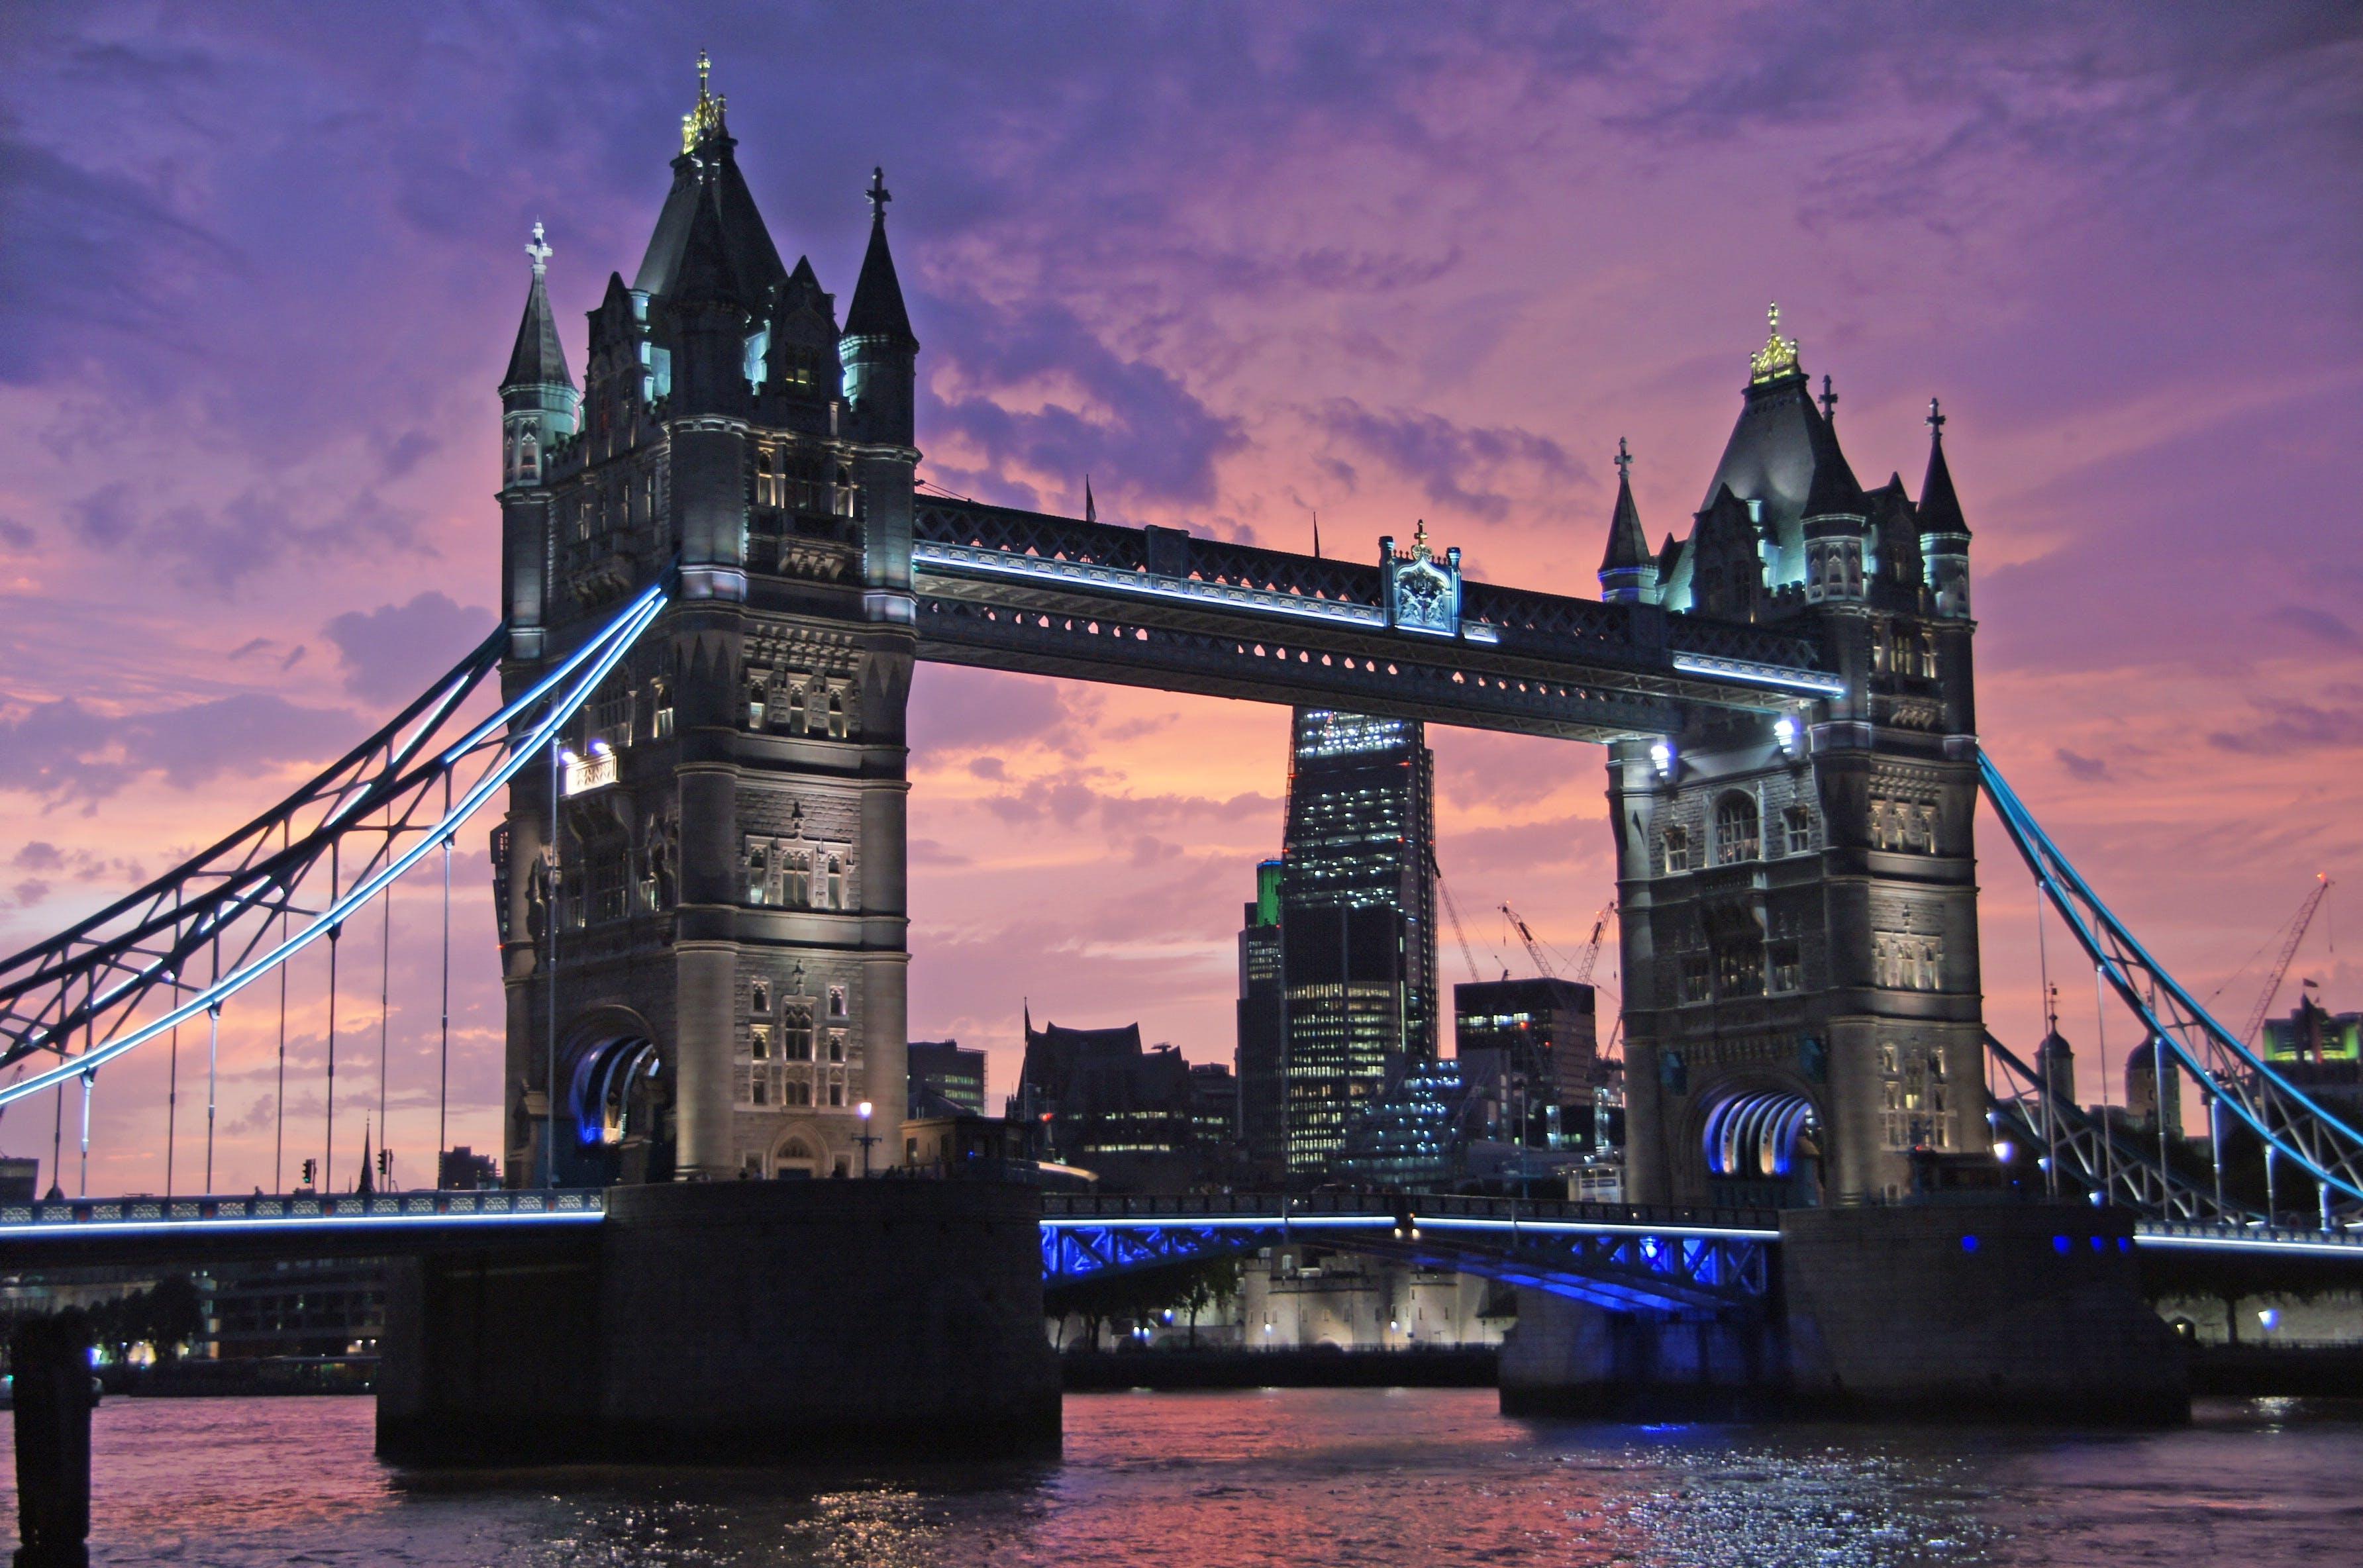 architecture, bascule bridge, bridge